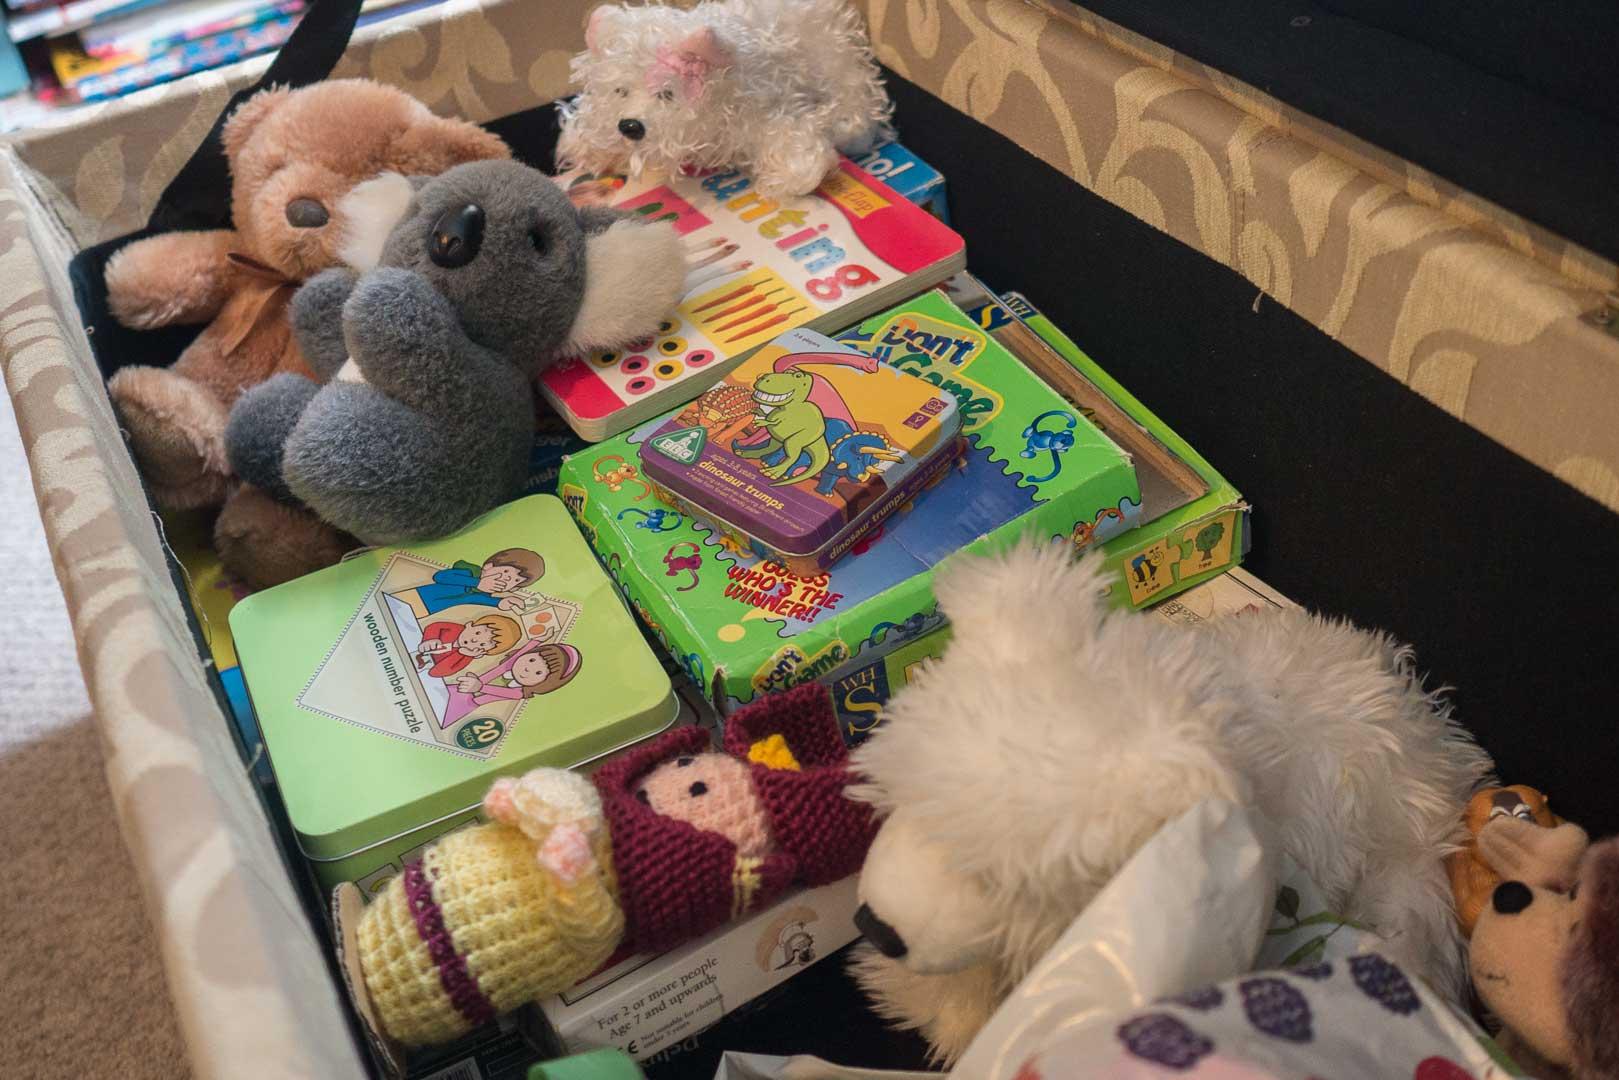 Sanaigmore cottage: we have toys aplenty!